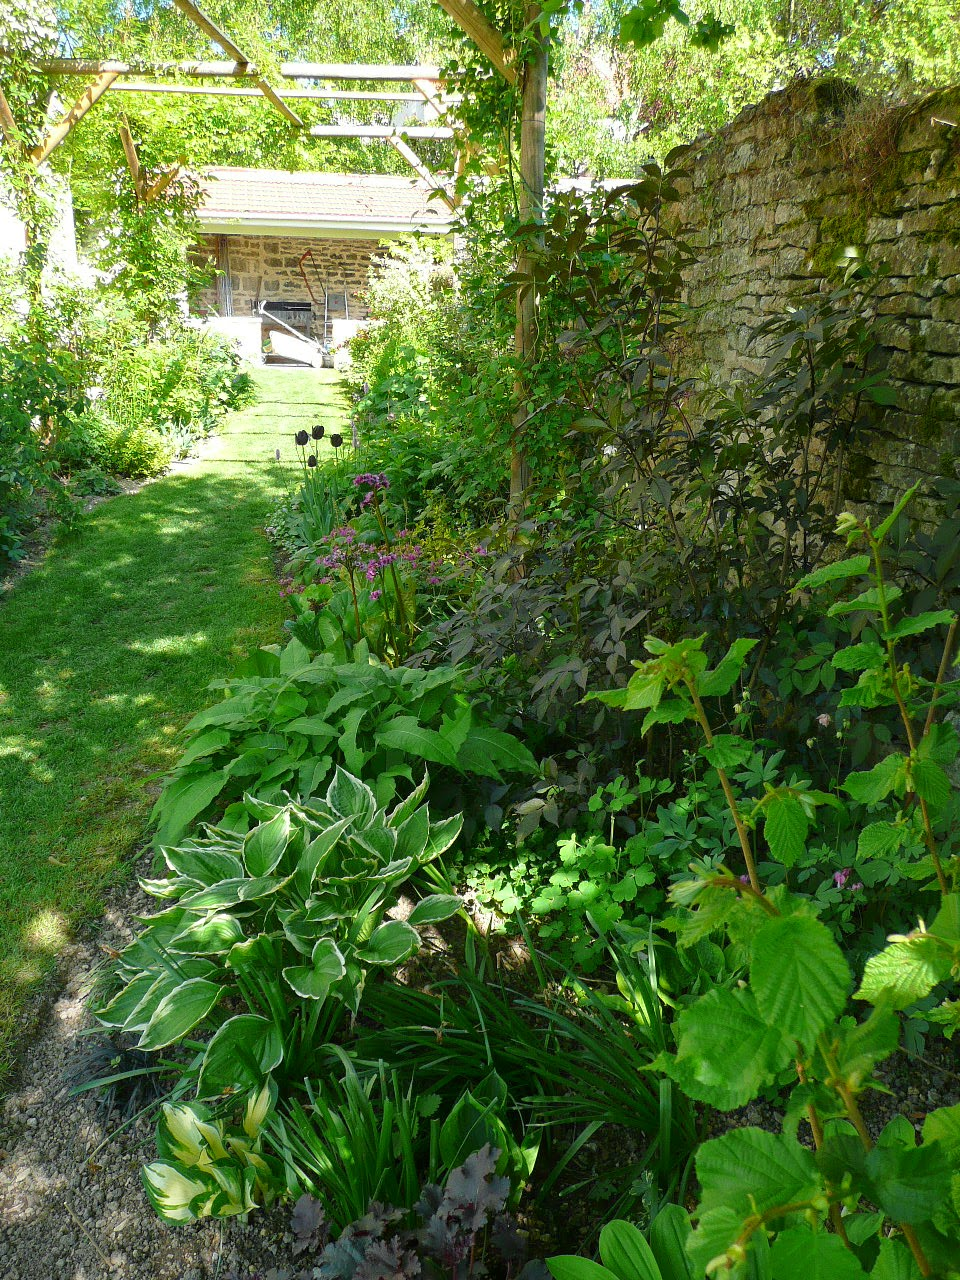 Notre jardin secret un dimanche au jardin for Au jardin secret